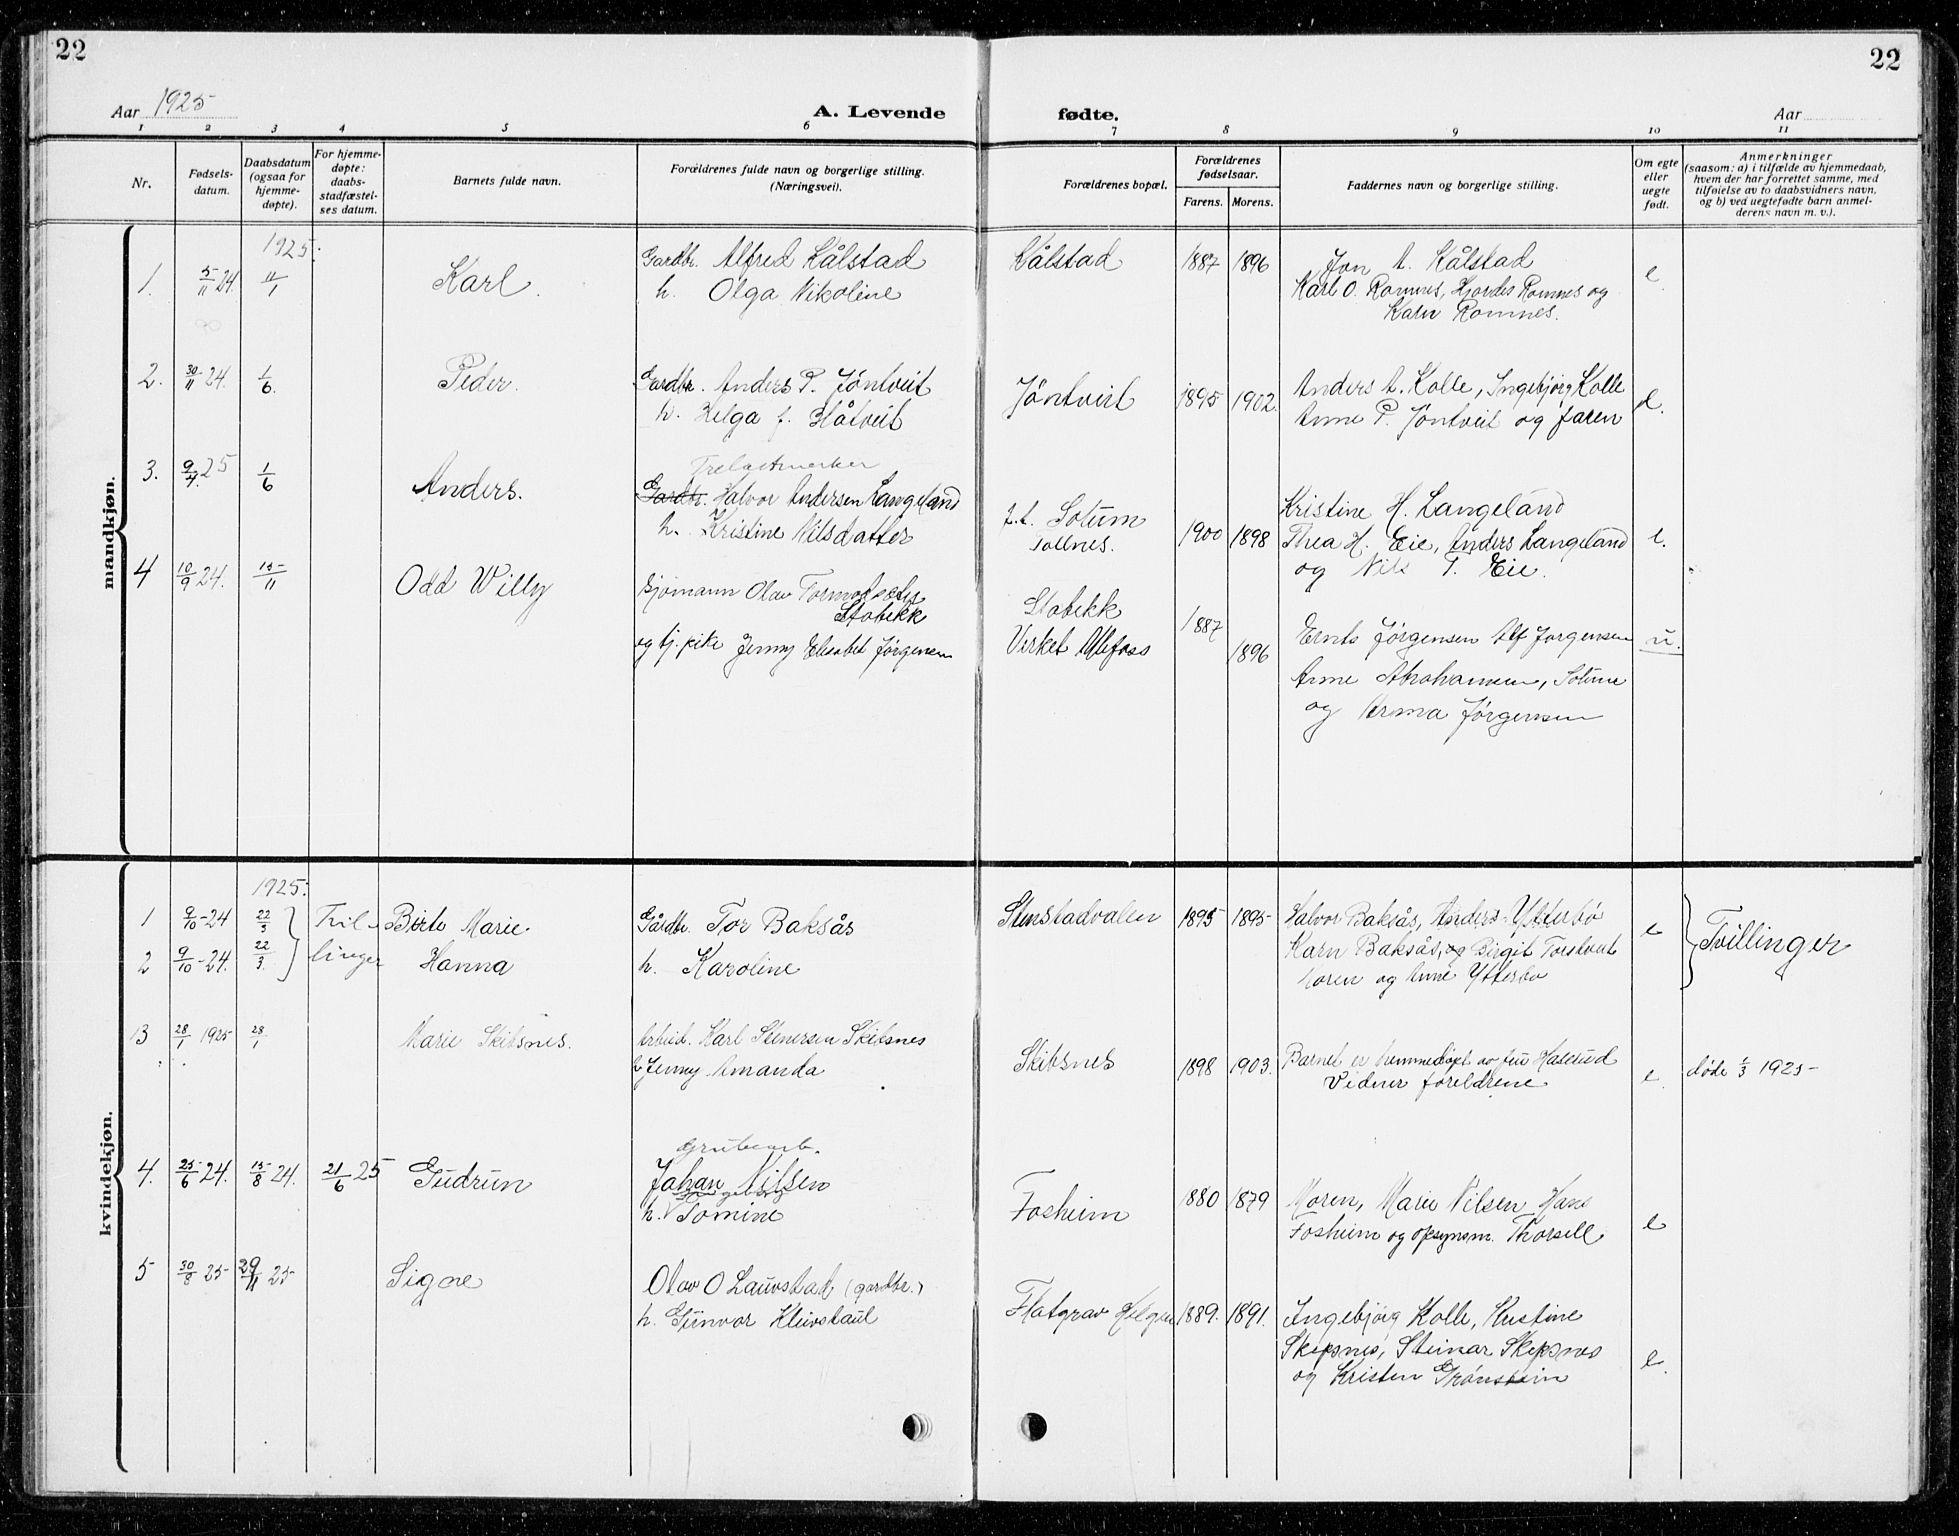 SAKO, Holla kirkebøker, G/Gb/L0003: Klokkerbok nr. II 3, 1914-1941, s. 22